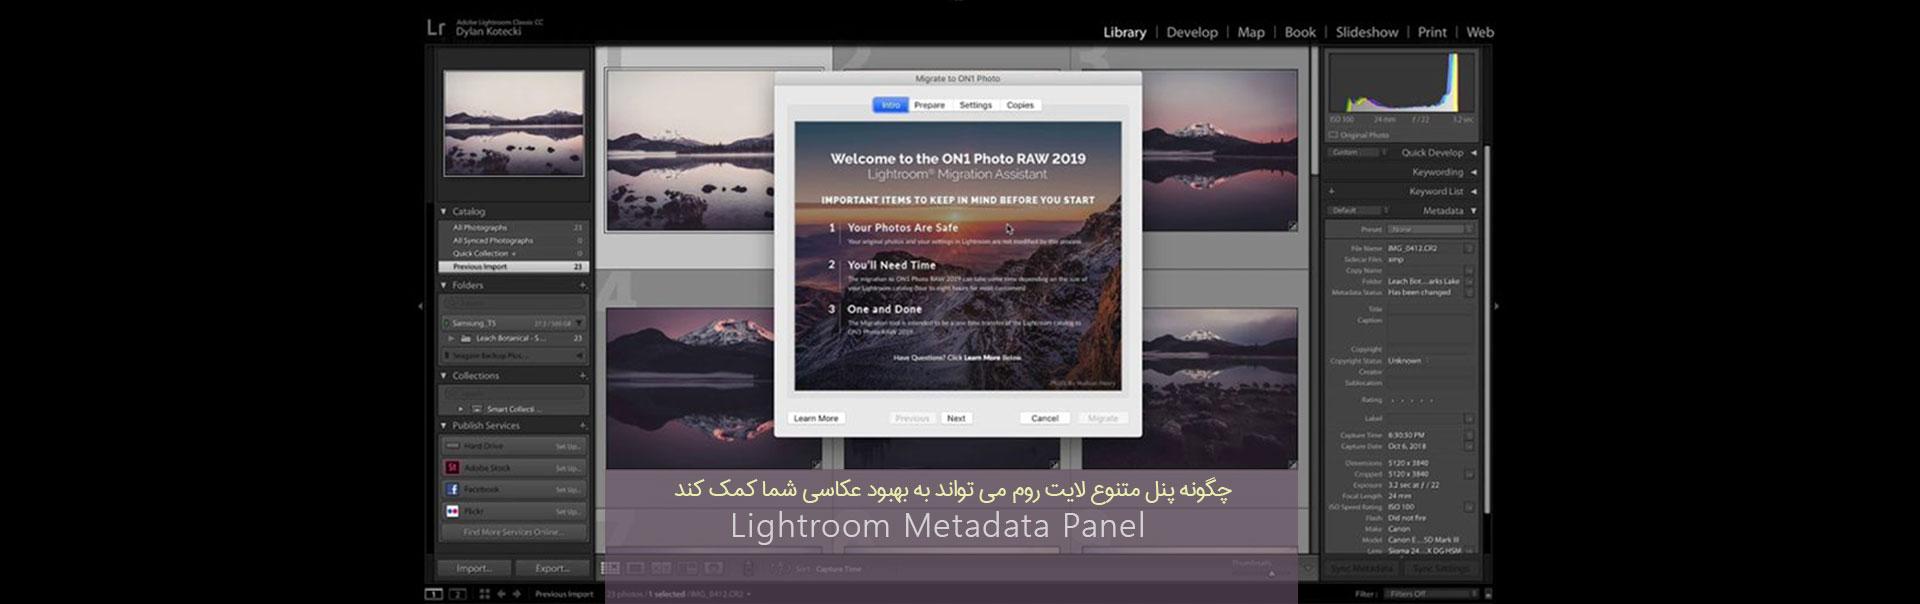 pouyaandish akasi lightroom1 - چگونه پنل لايت روم مي تواند به بهبود عکاسي شما کمک کند